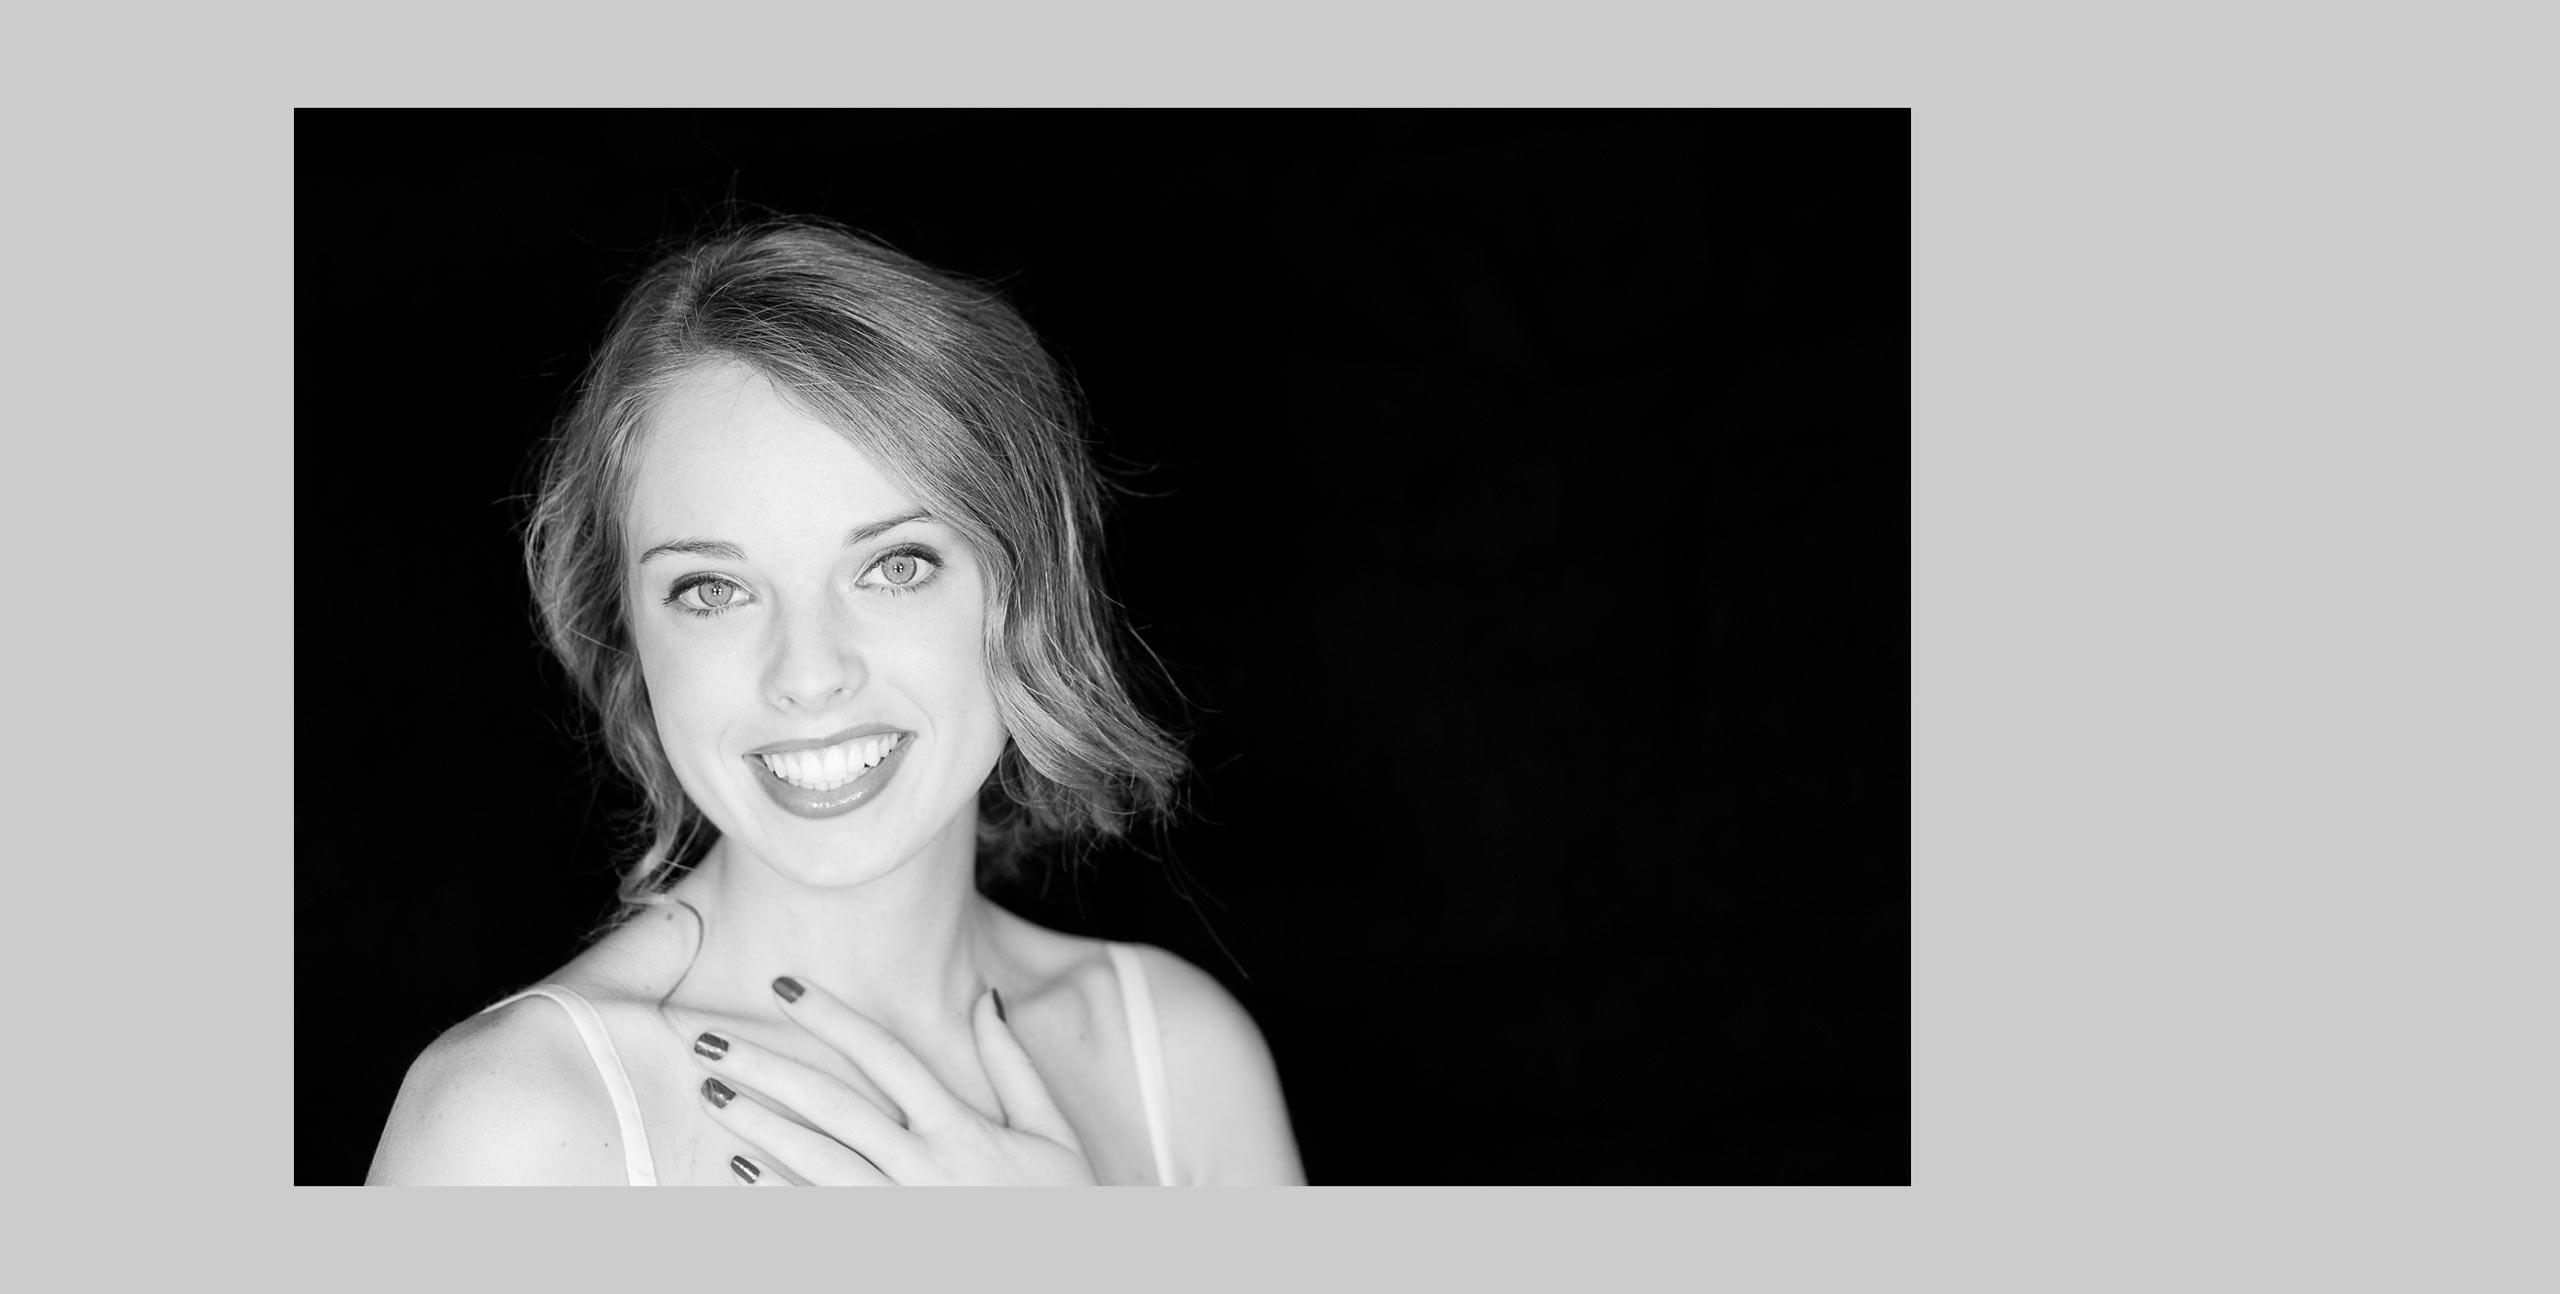 chicago senior portrait photographer claire spreads (18)